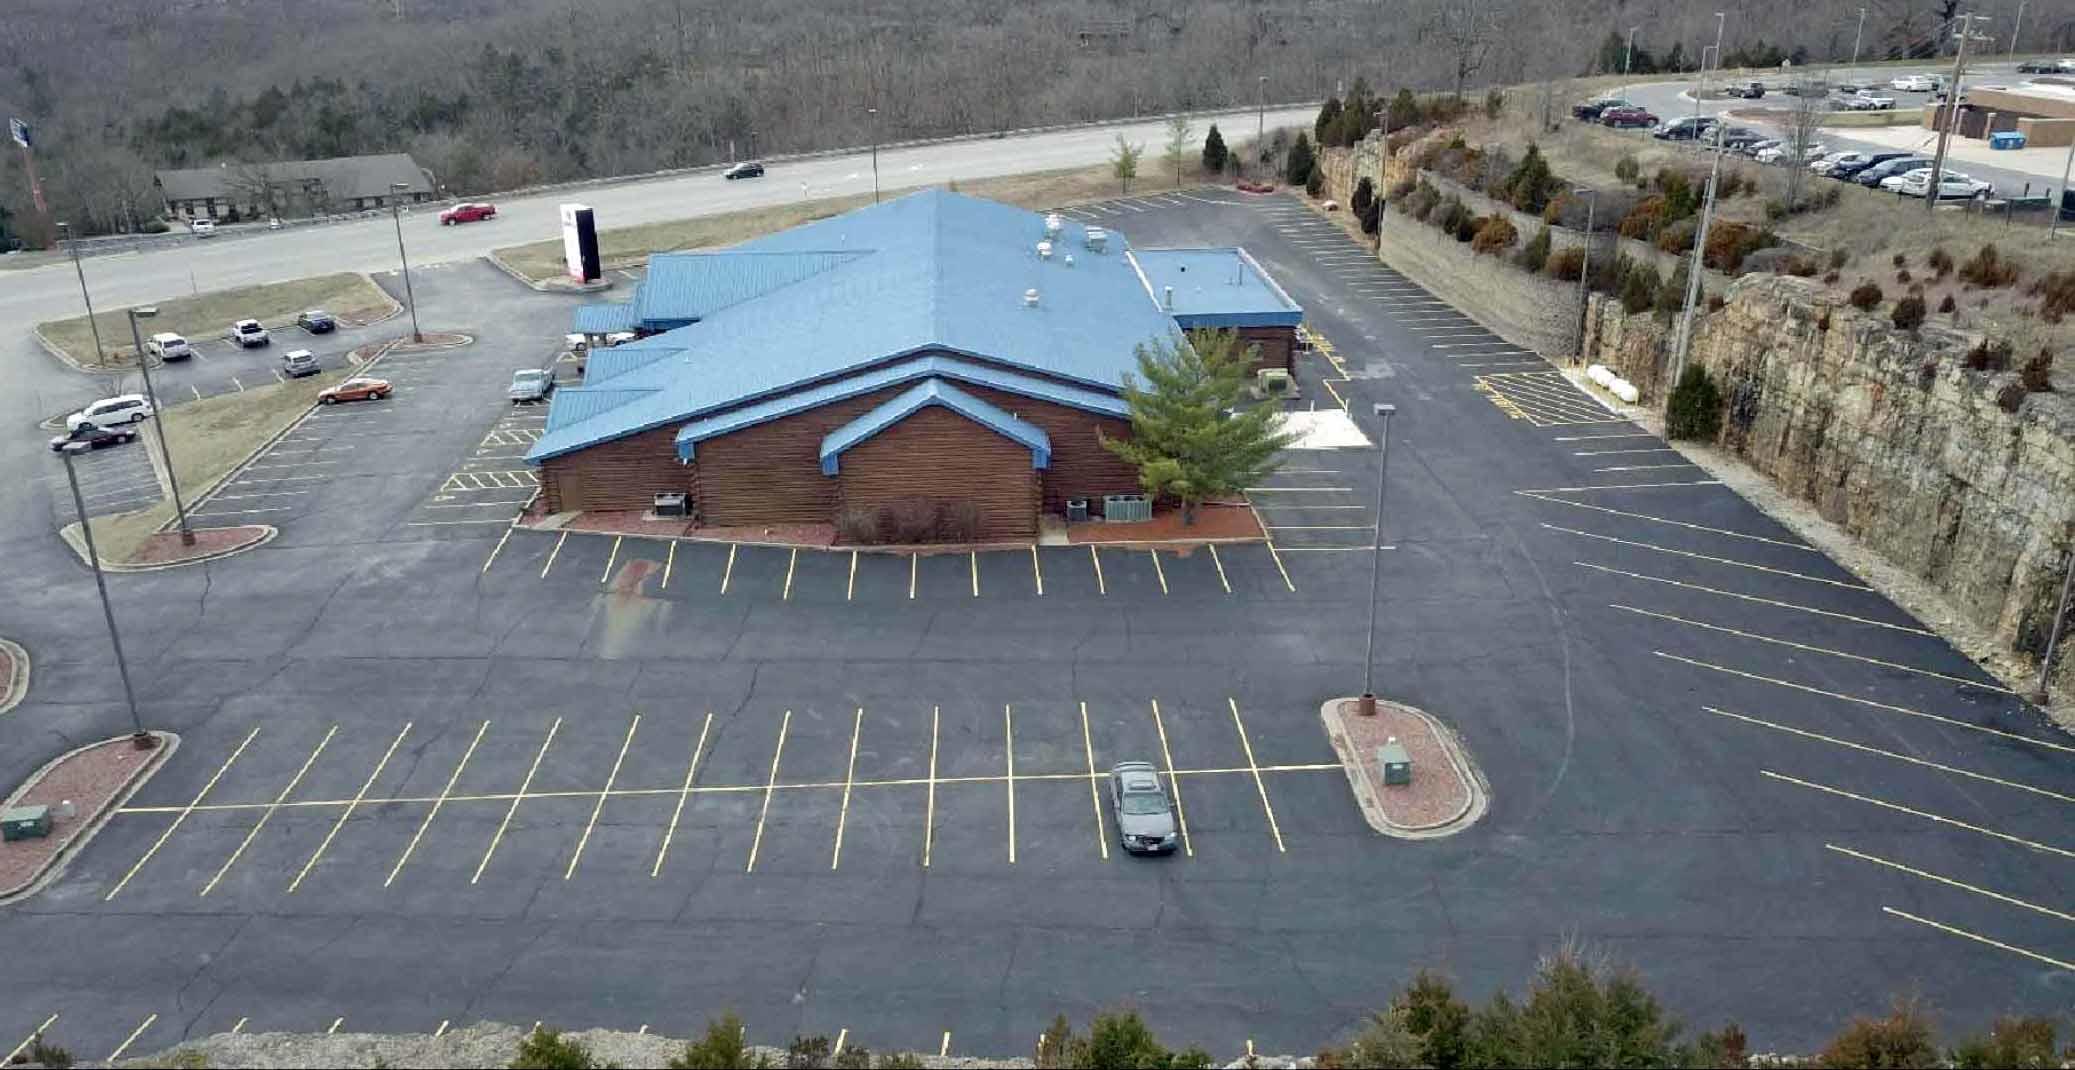 440 State Highway 248 Branson, MO 65616